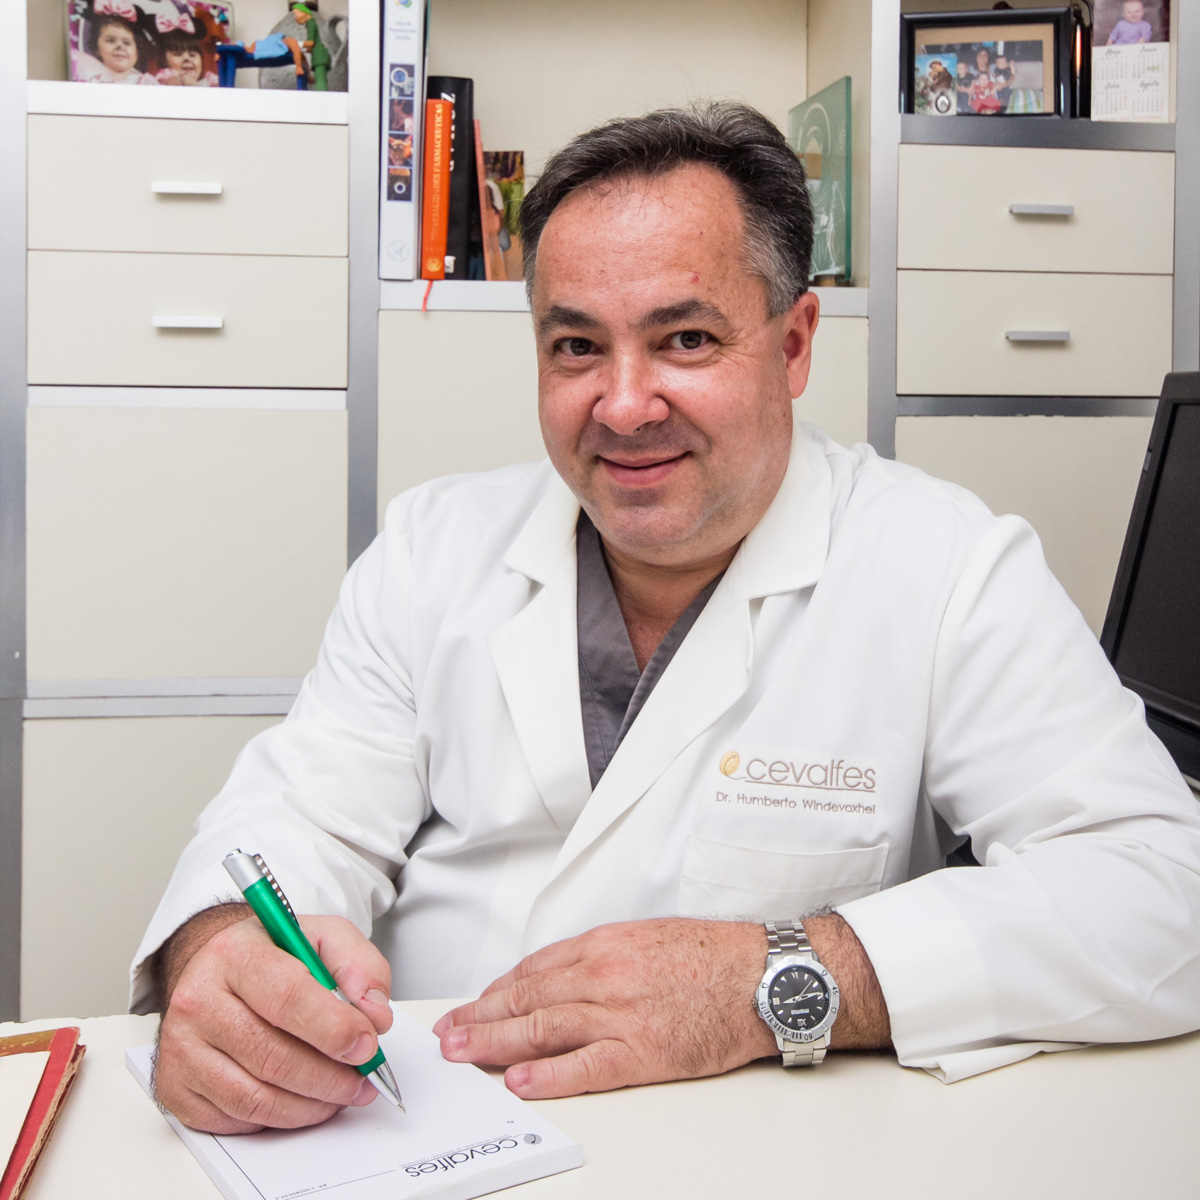 Dr. Humberto Windevoxhel